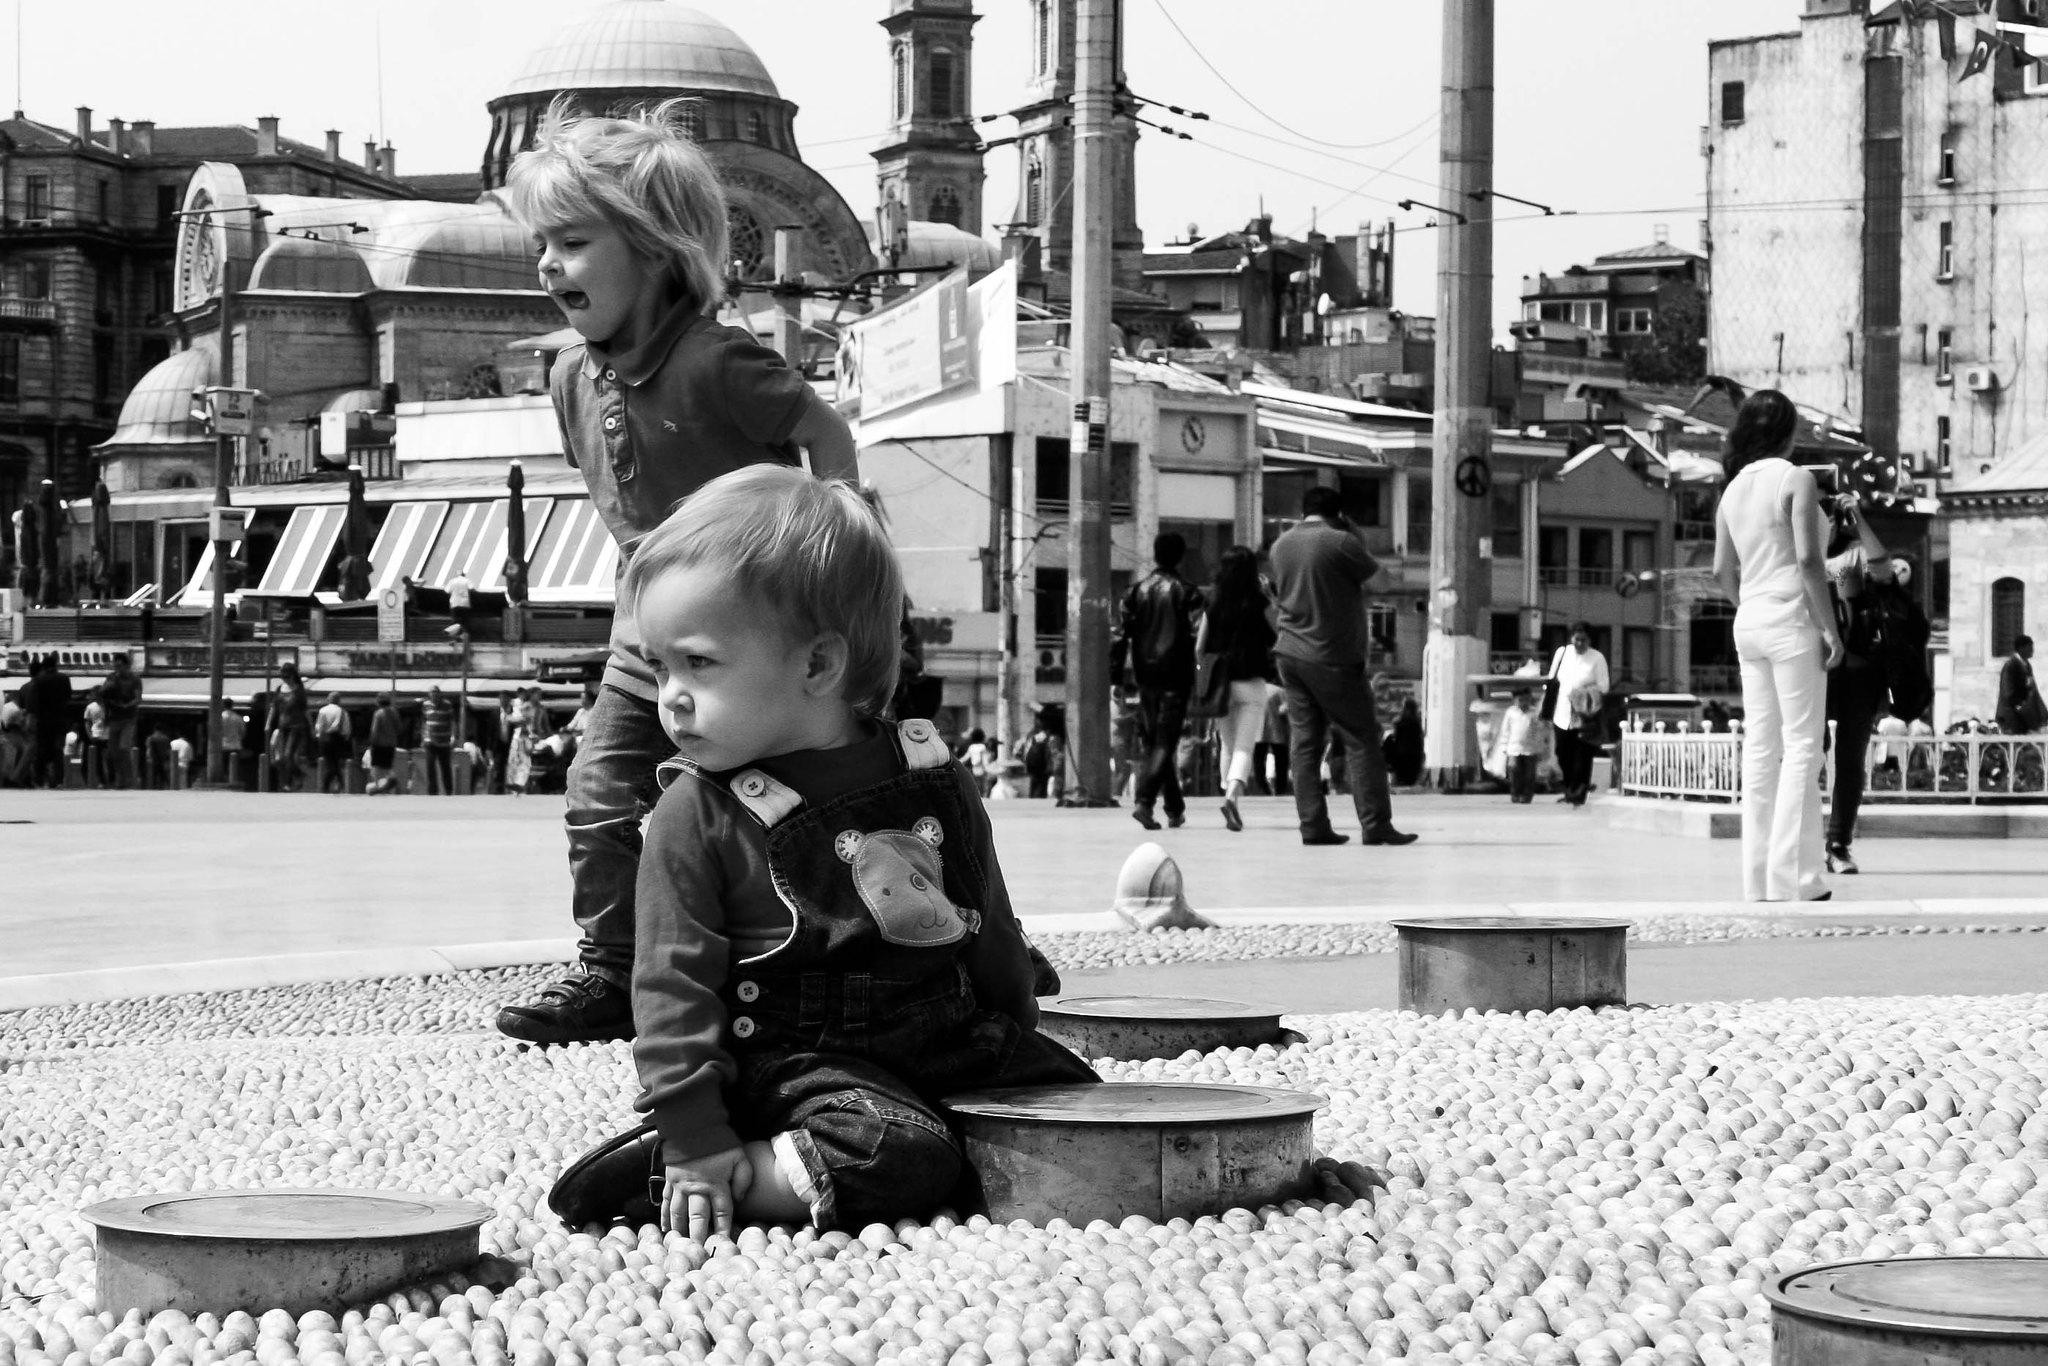 taksim square